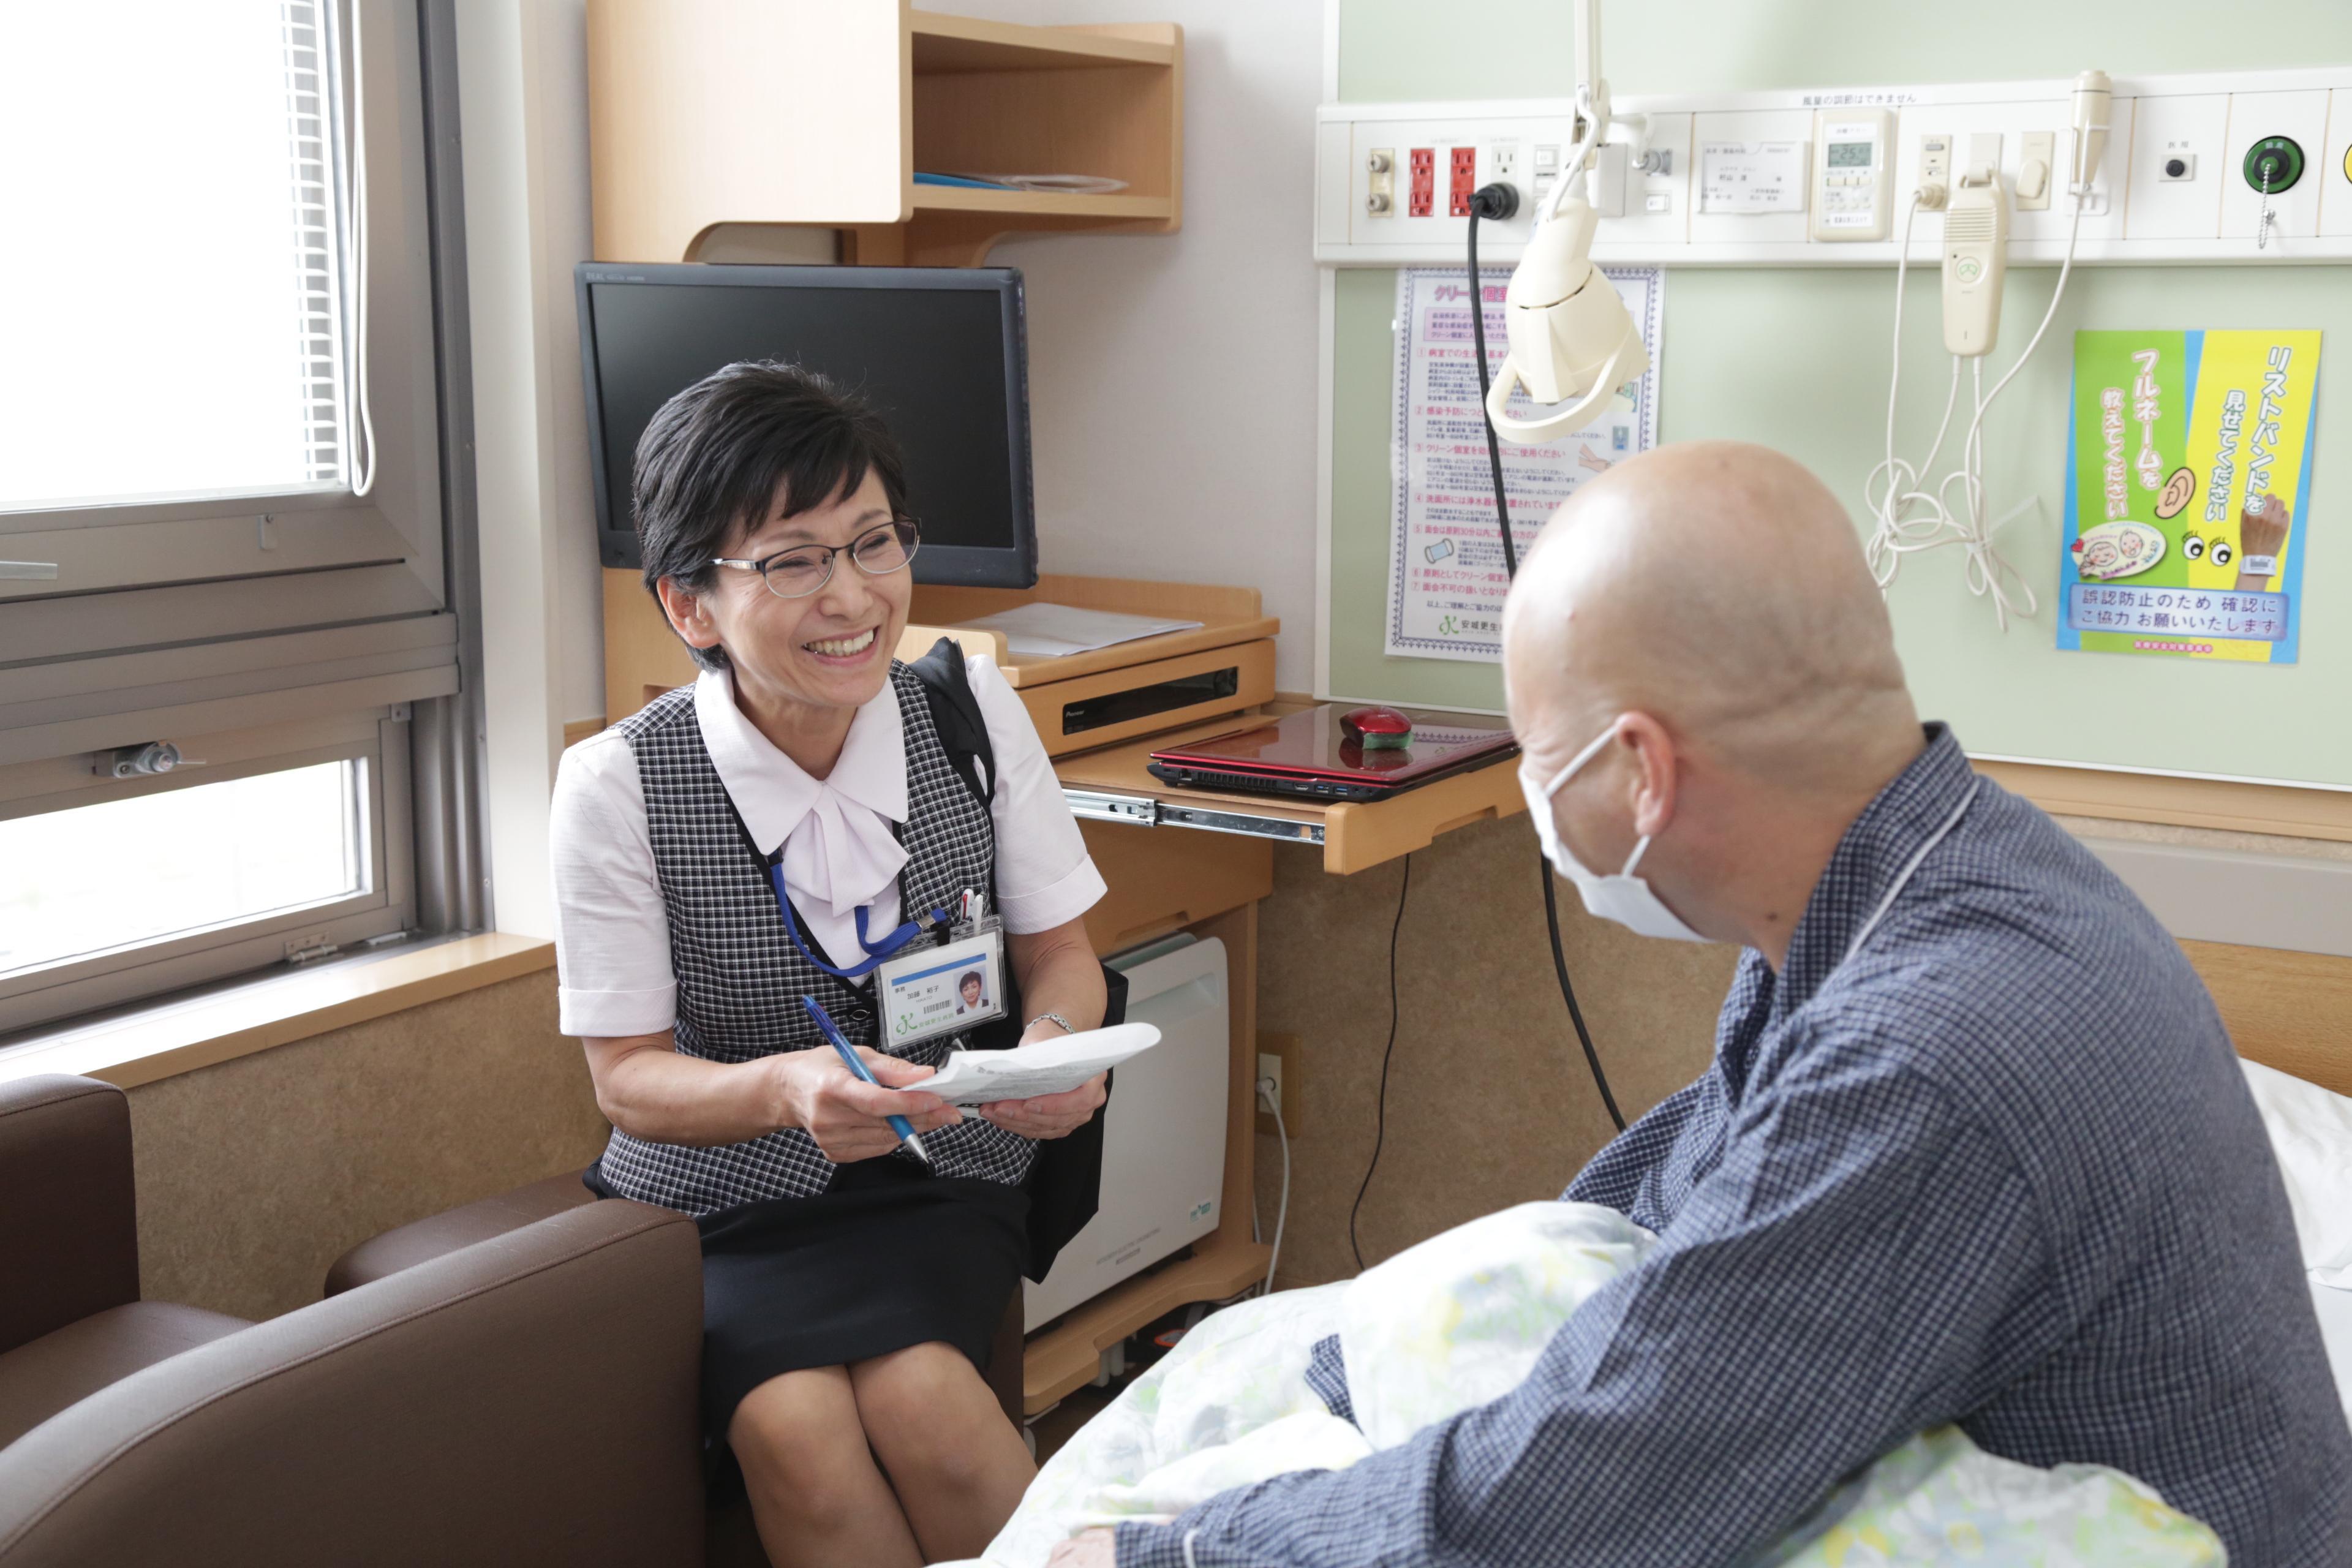 02 Patients meeting.JPG